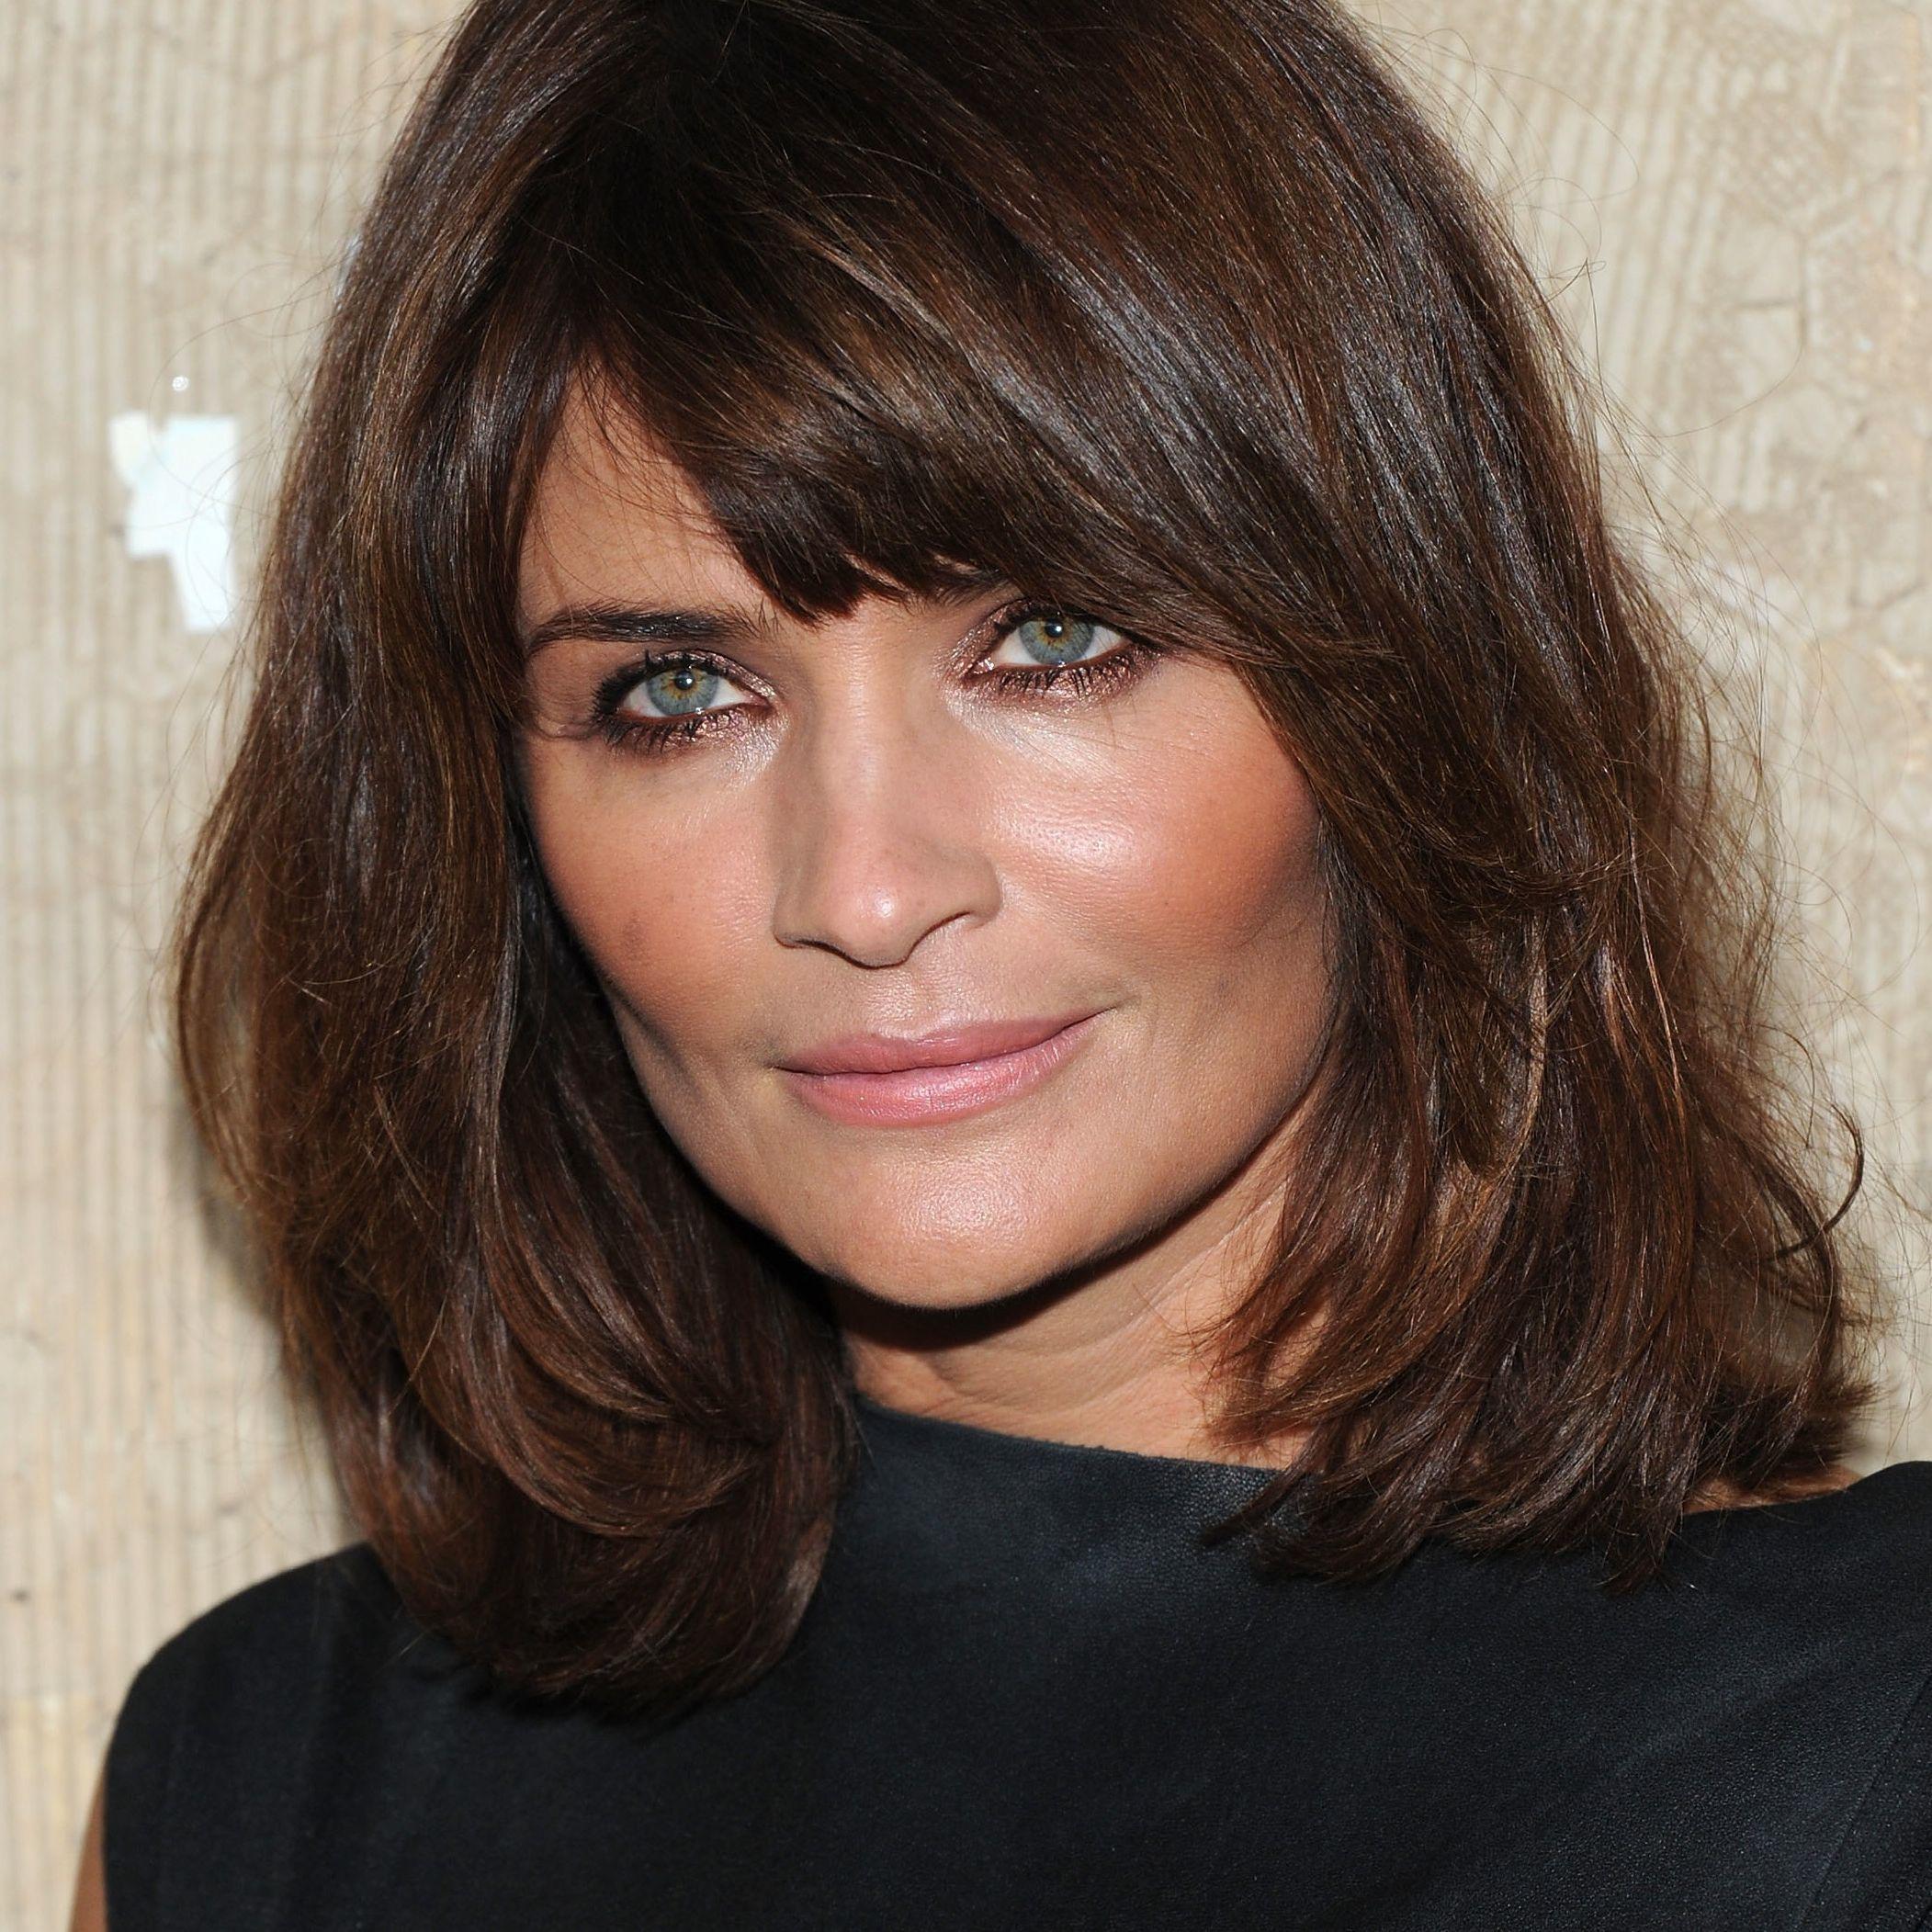 Side-swept Bangs, Shoulder-length Hair for Square Faces